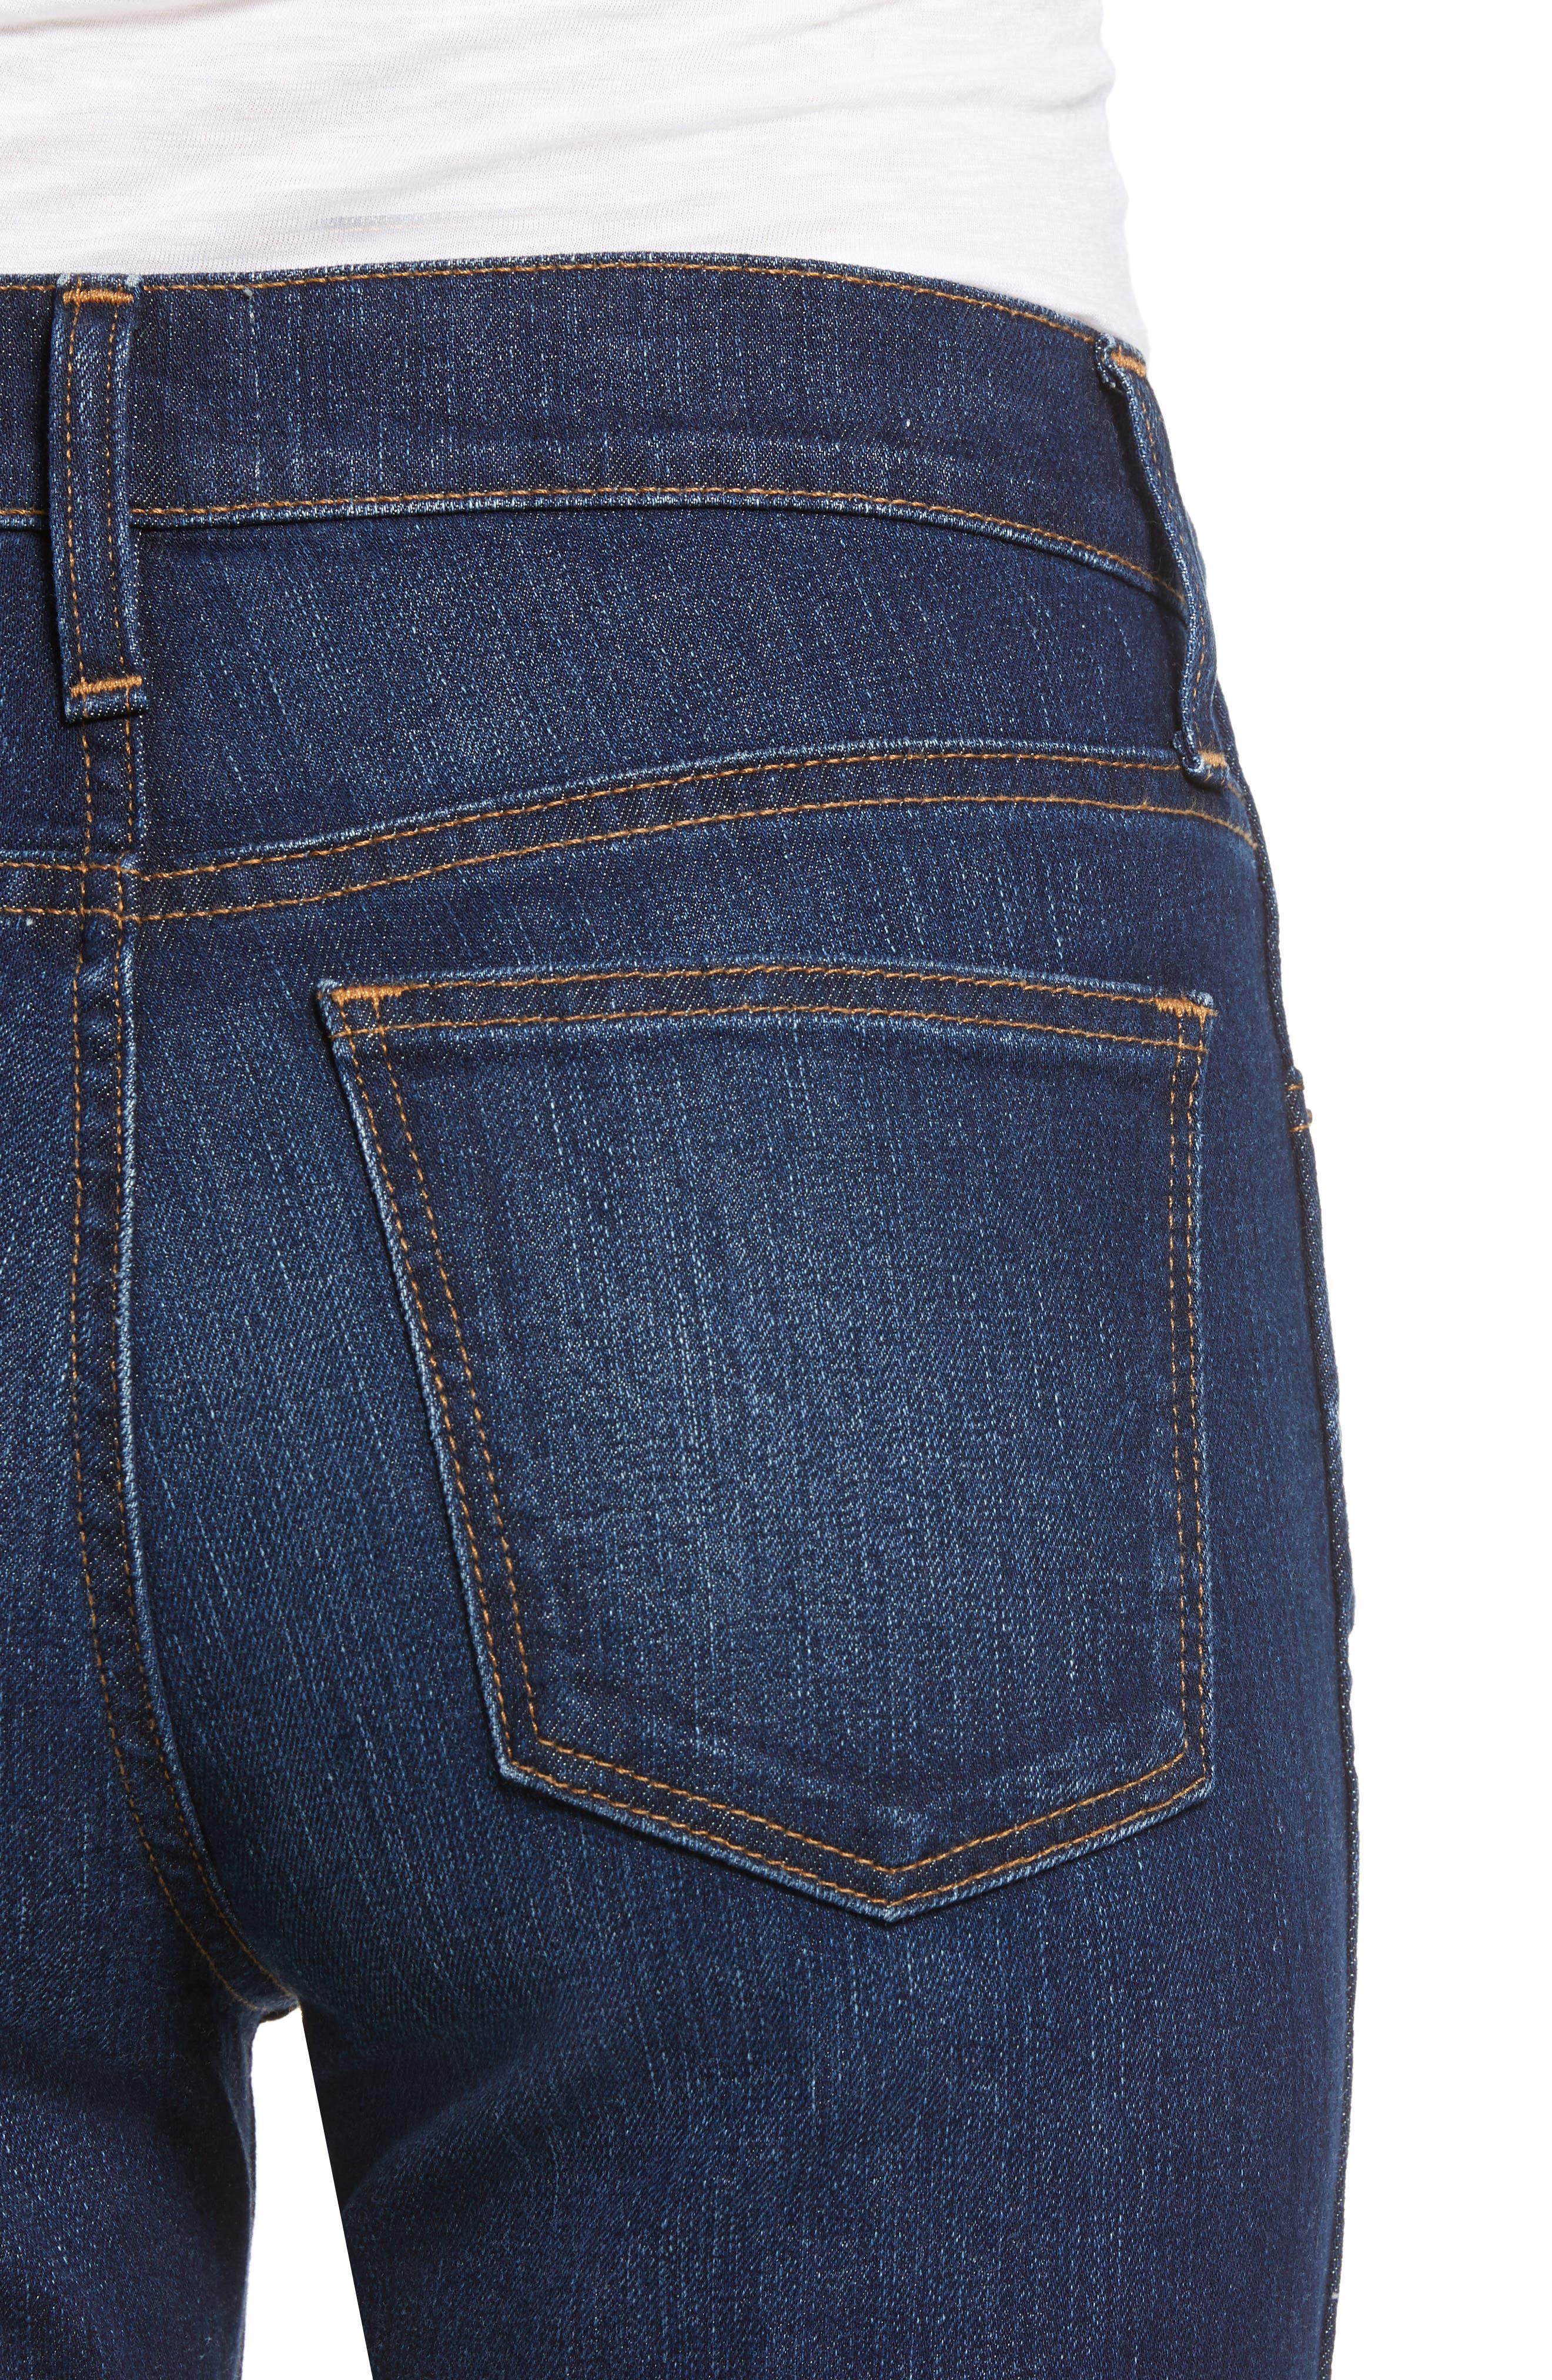 Slim Straight Jeans,                             Alternate thumbnail 4, color,                             420